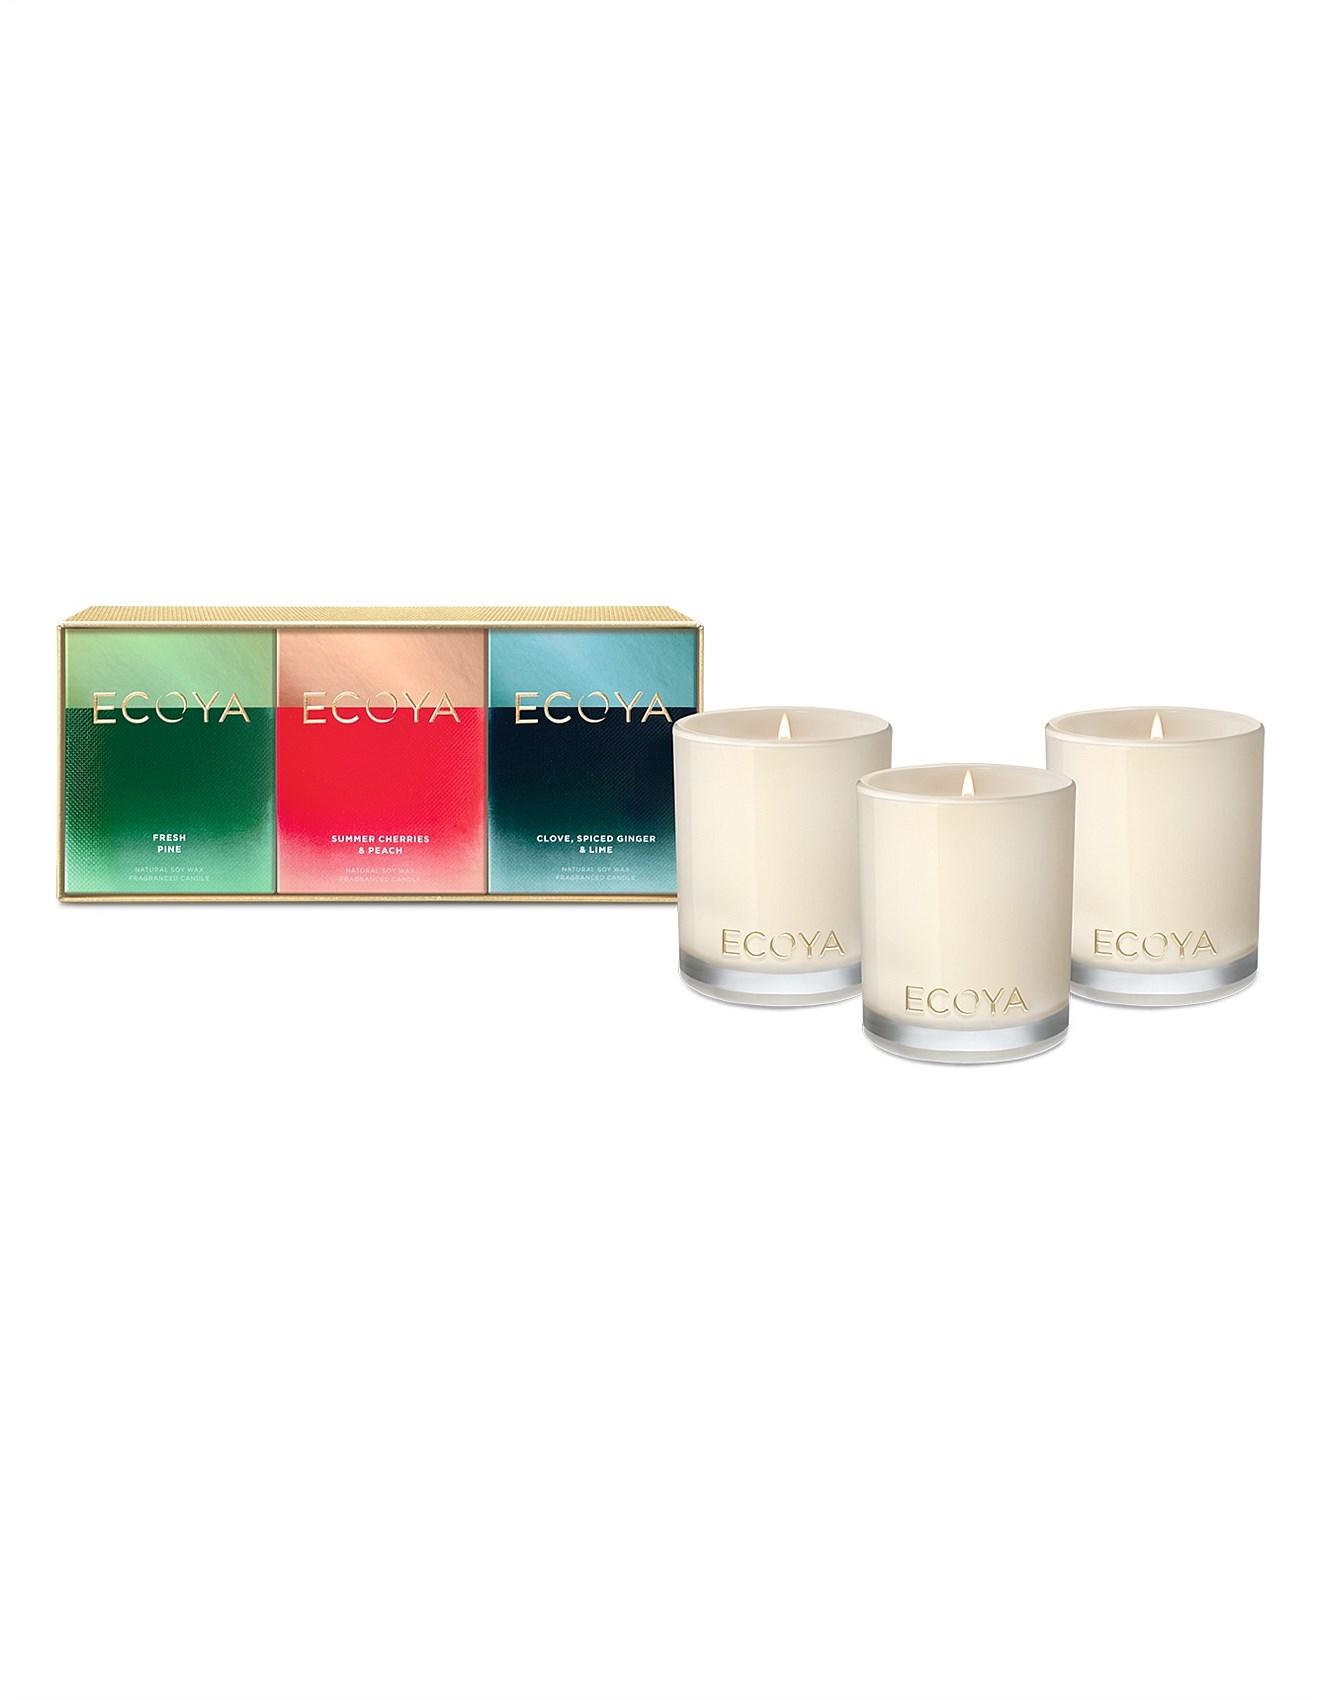 Gift Sets | Fragrance, Makeup, Skincare Gifts | David Jones ...